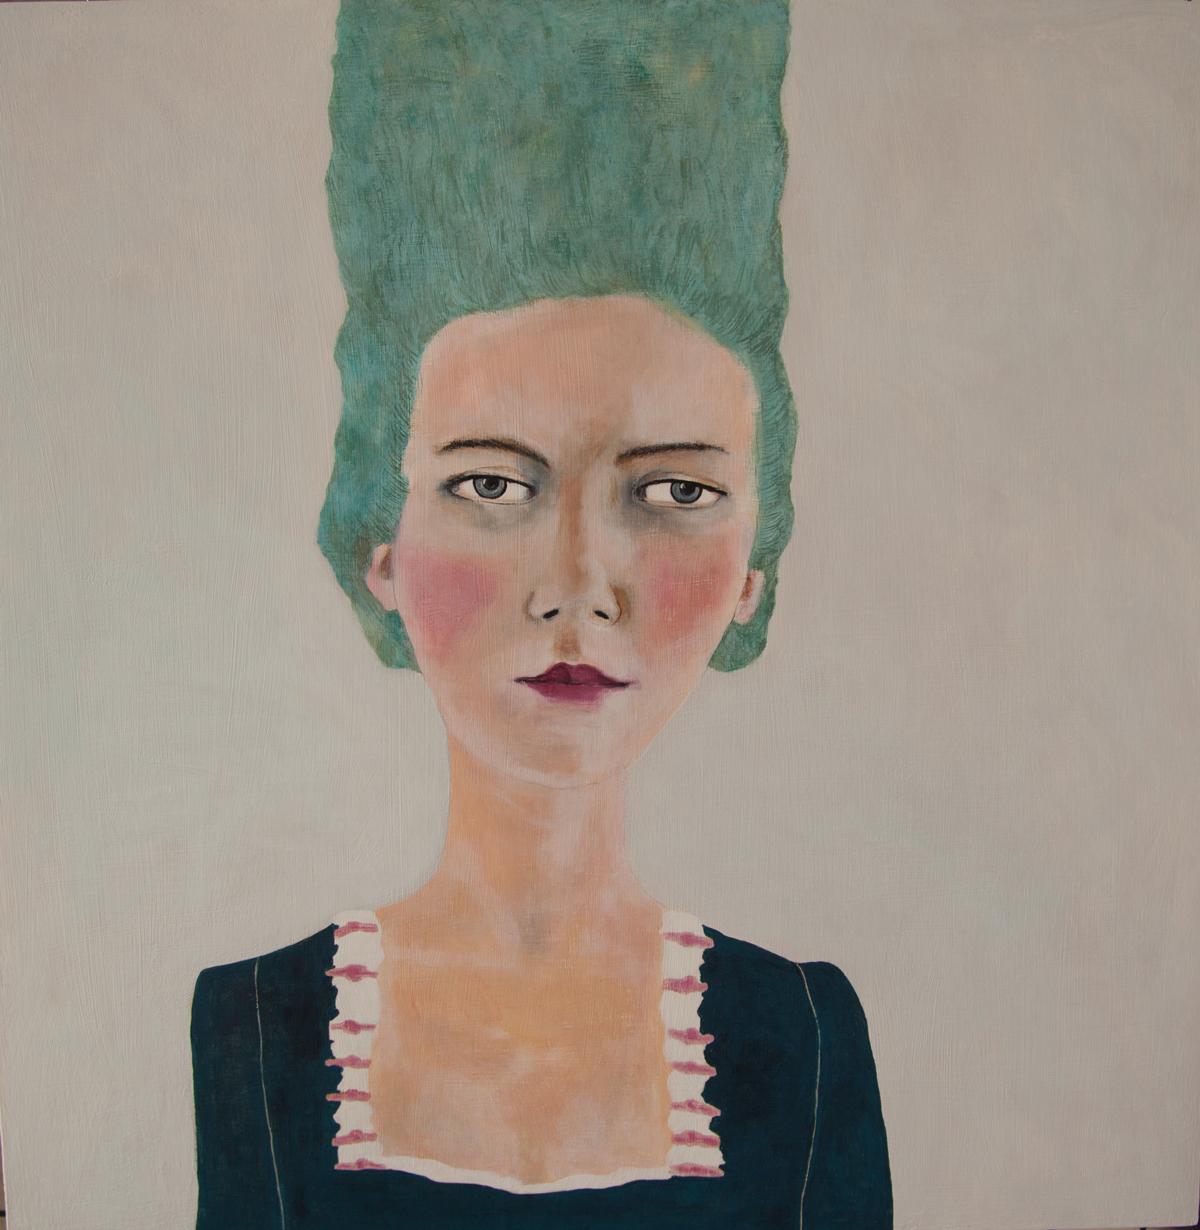 Isabella Di Sclafani. When Marie Antoinette was a Punk Rocker 5. Acrylic on Panel. 2015.